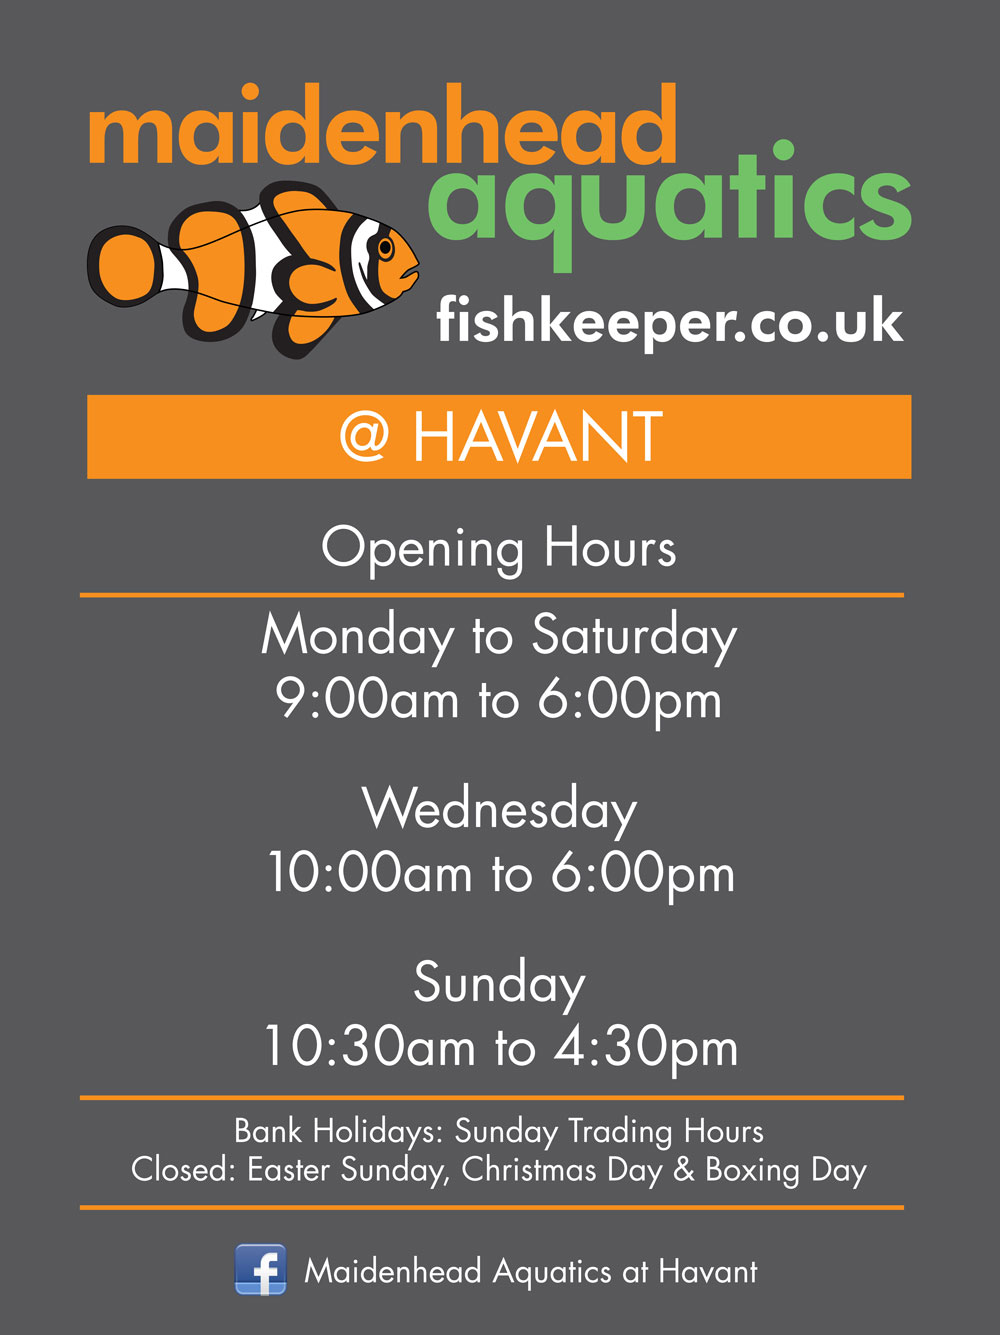 Maidenhead Aquatics Havant Opening Times